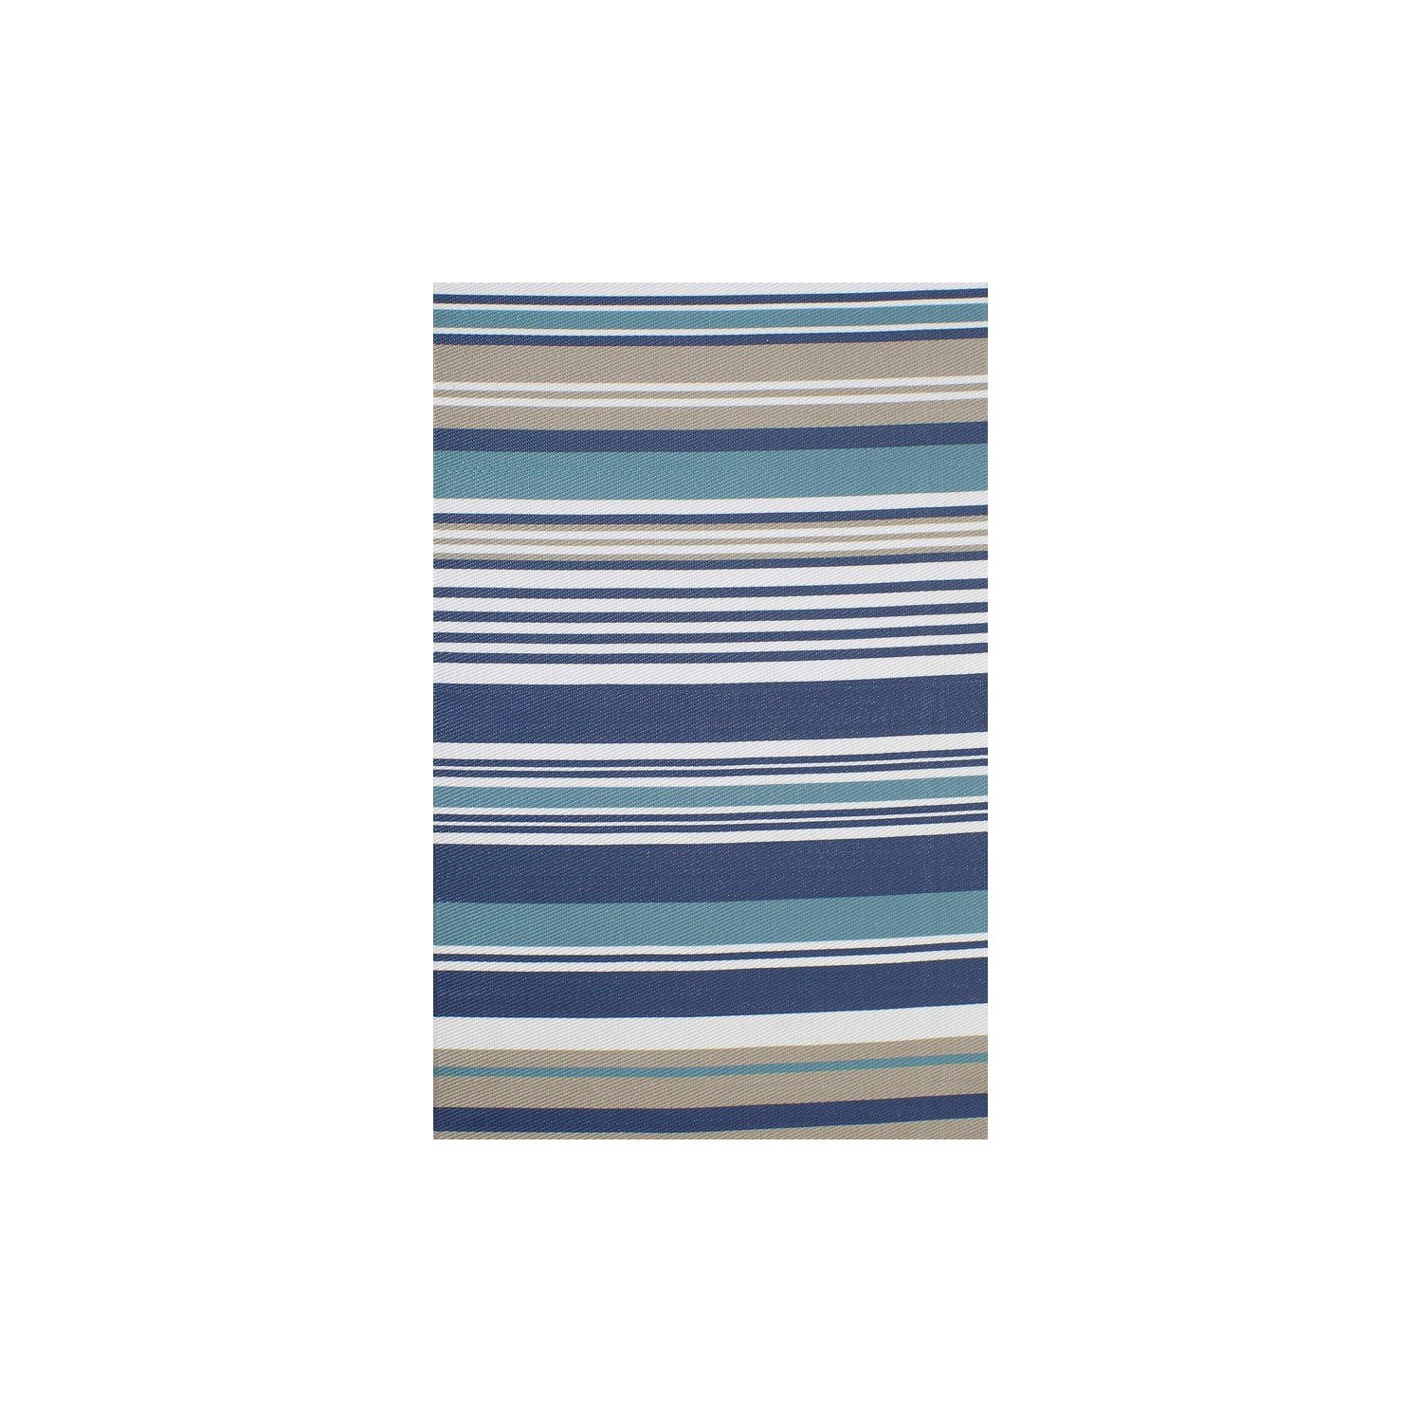 wundersch nen tapis bleu l 39 id e d 39 un tapis de bain. Black Bedroom Furniture Sets. Home Design Ideas